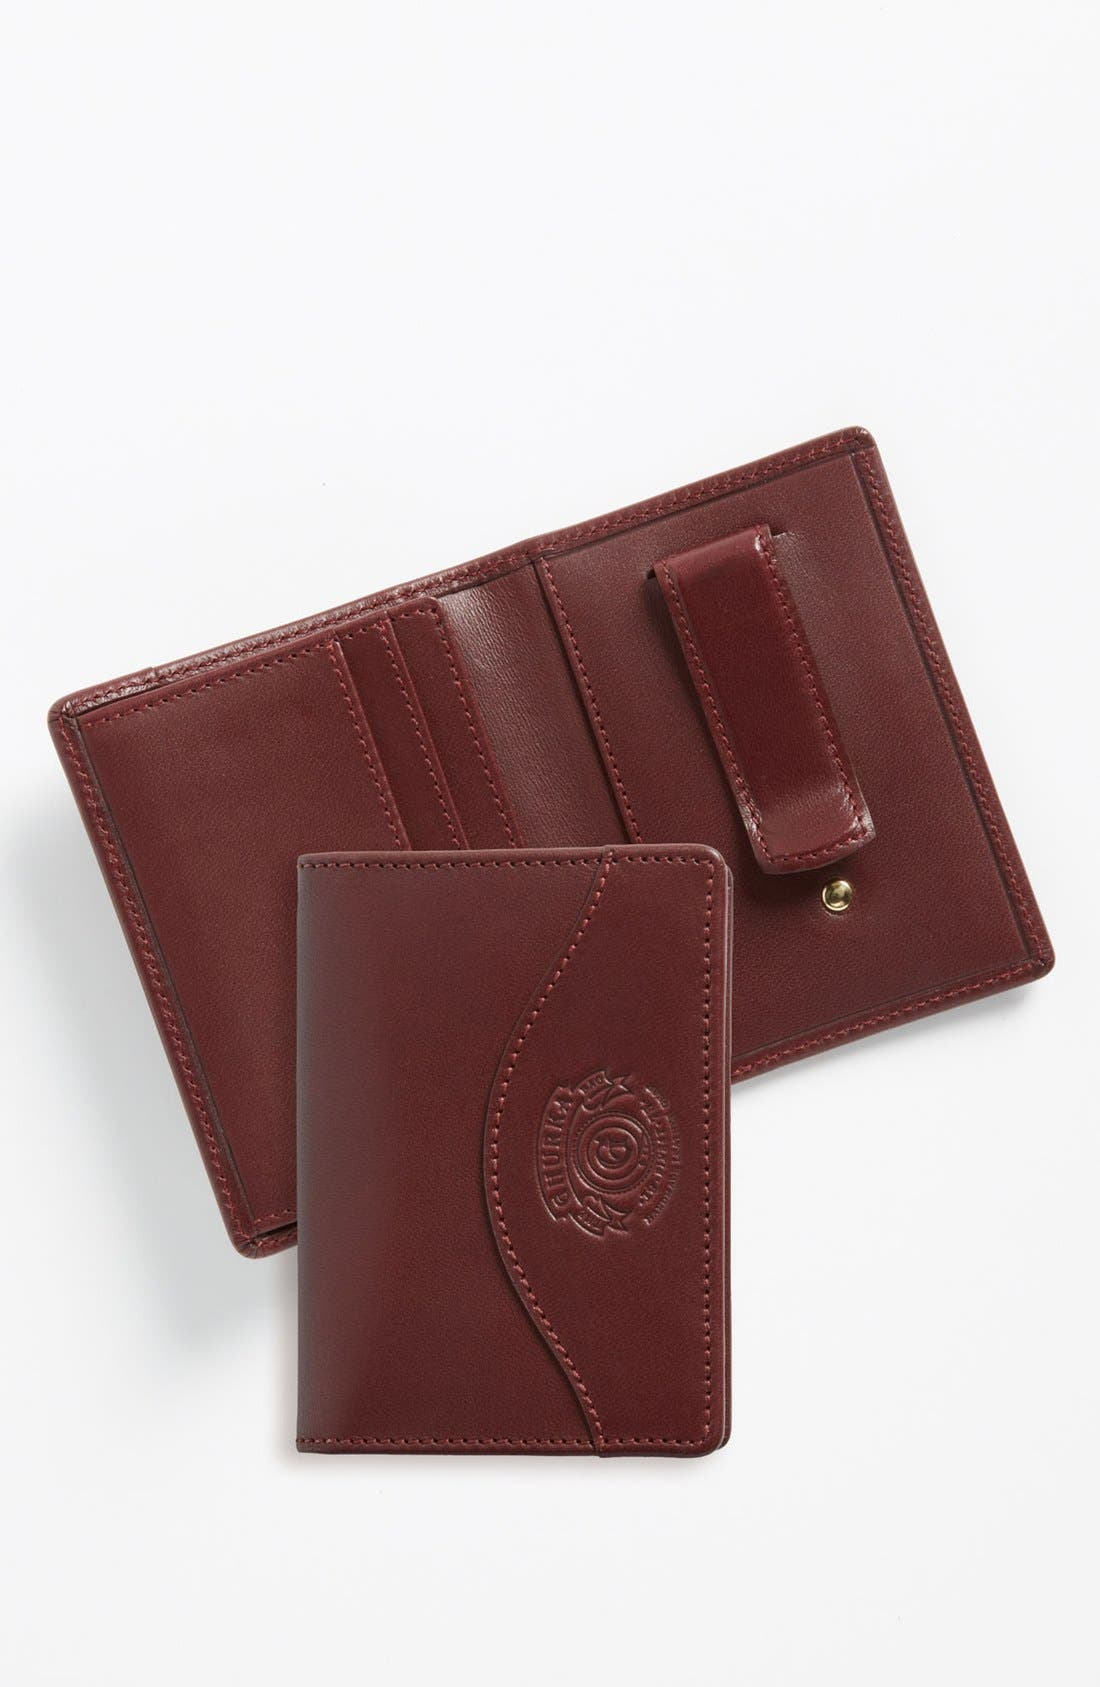 Main Image - Ghurka Leather Money Clip Wallet